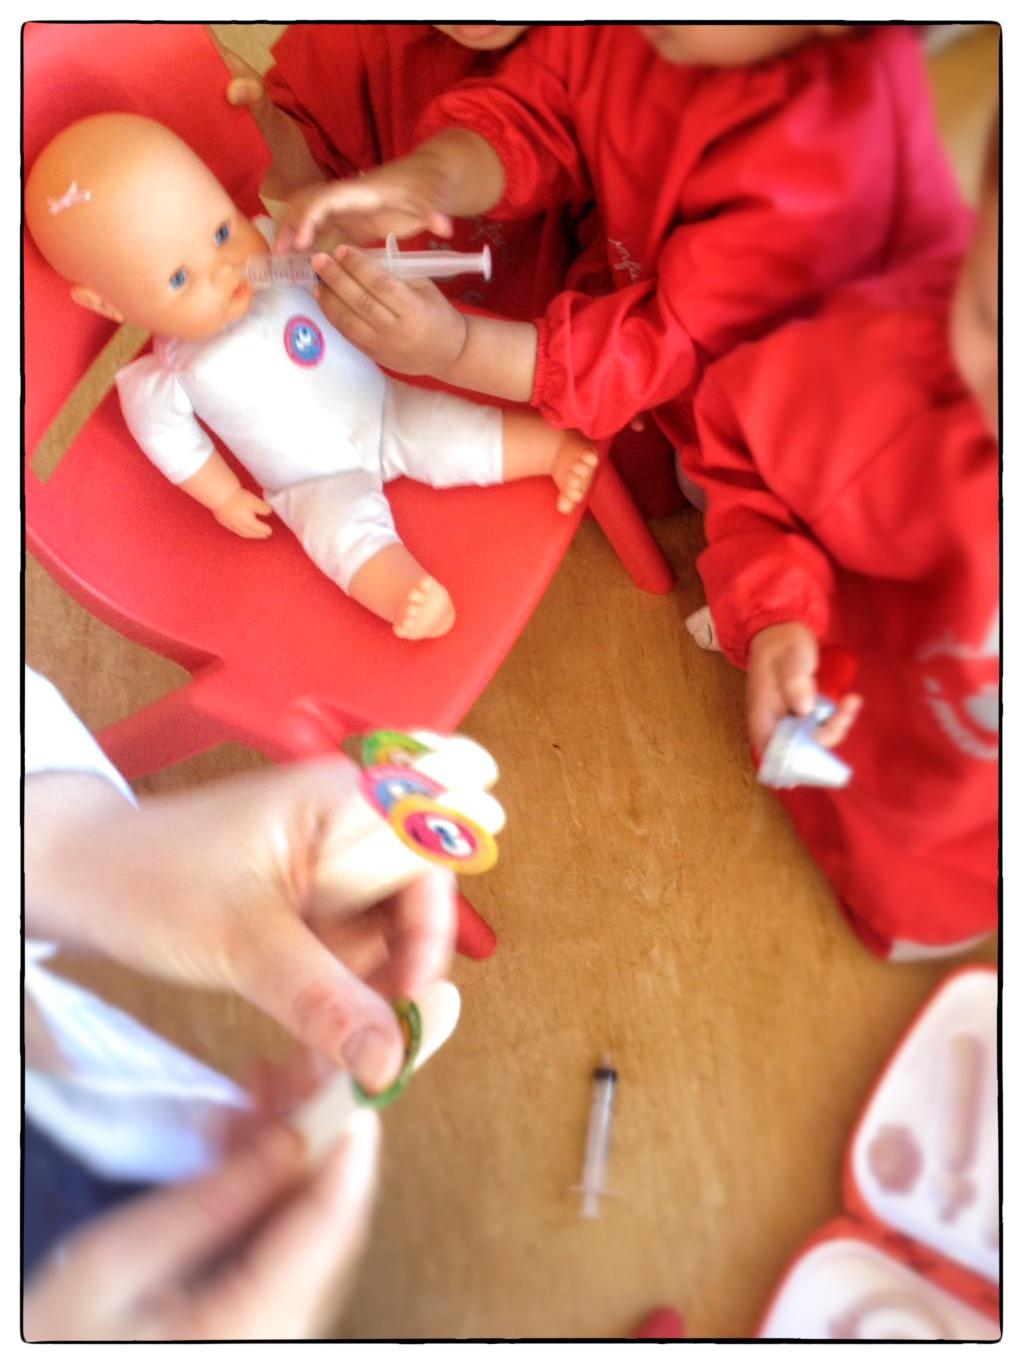 Escuela infantil piquio pozuelo pediatra piquio escuela infantil piquio pozuelo - Escuela infantil pozuelo ...